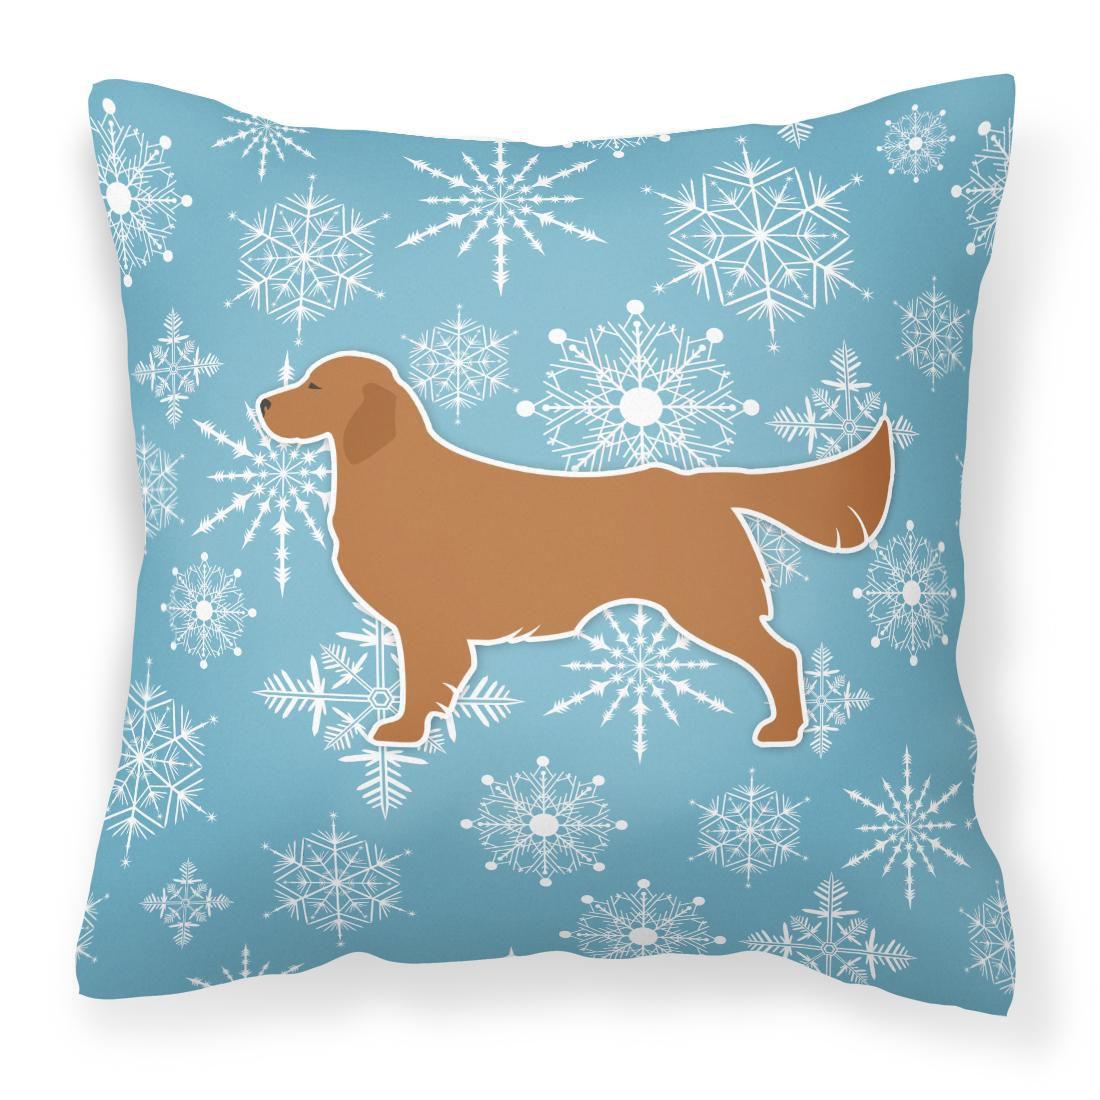 Caroline's Treasures BB3504PW1818 Winter Snowflake Golden Retriever Fabric Decorative Pillow , 18H x18W, multicolor